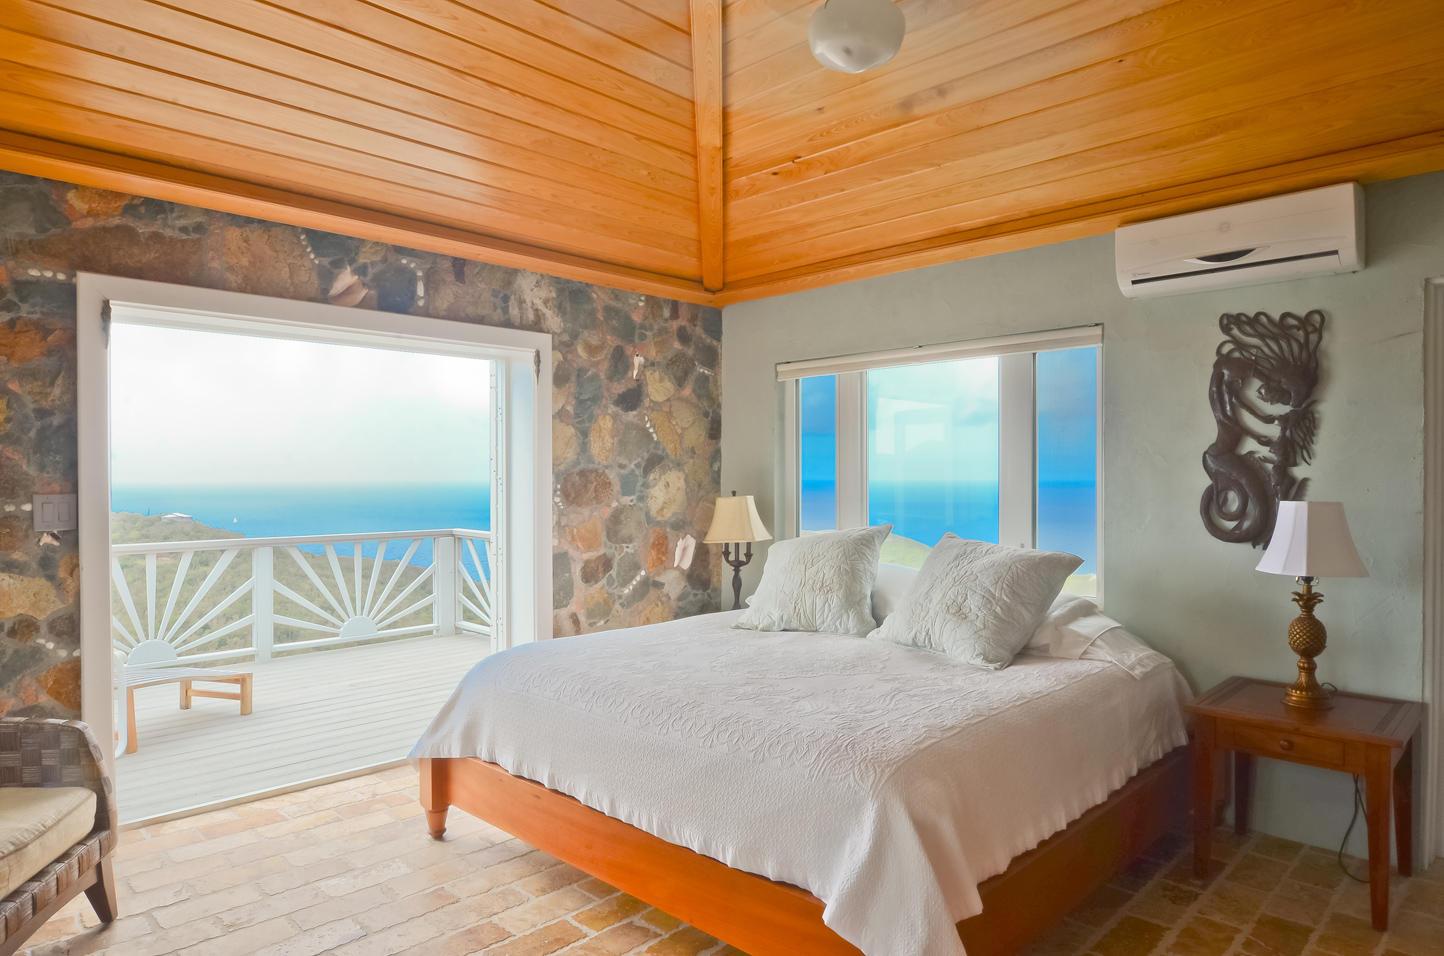 Cabana Bed Alt View